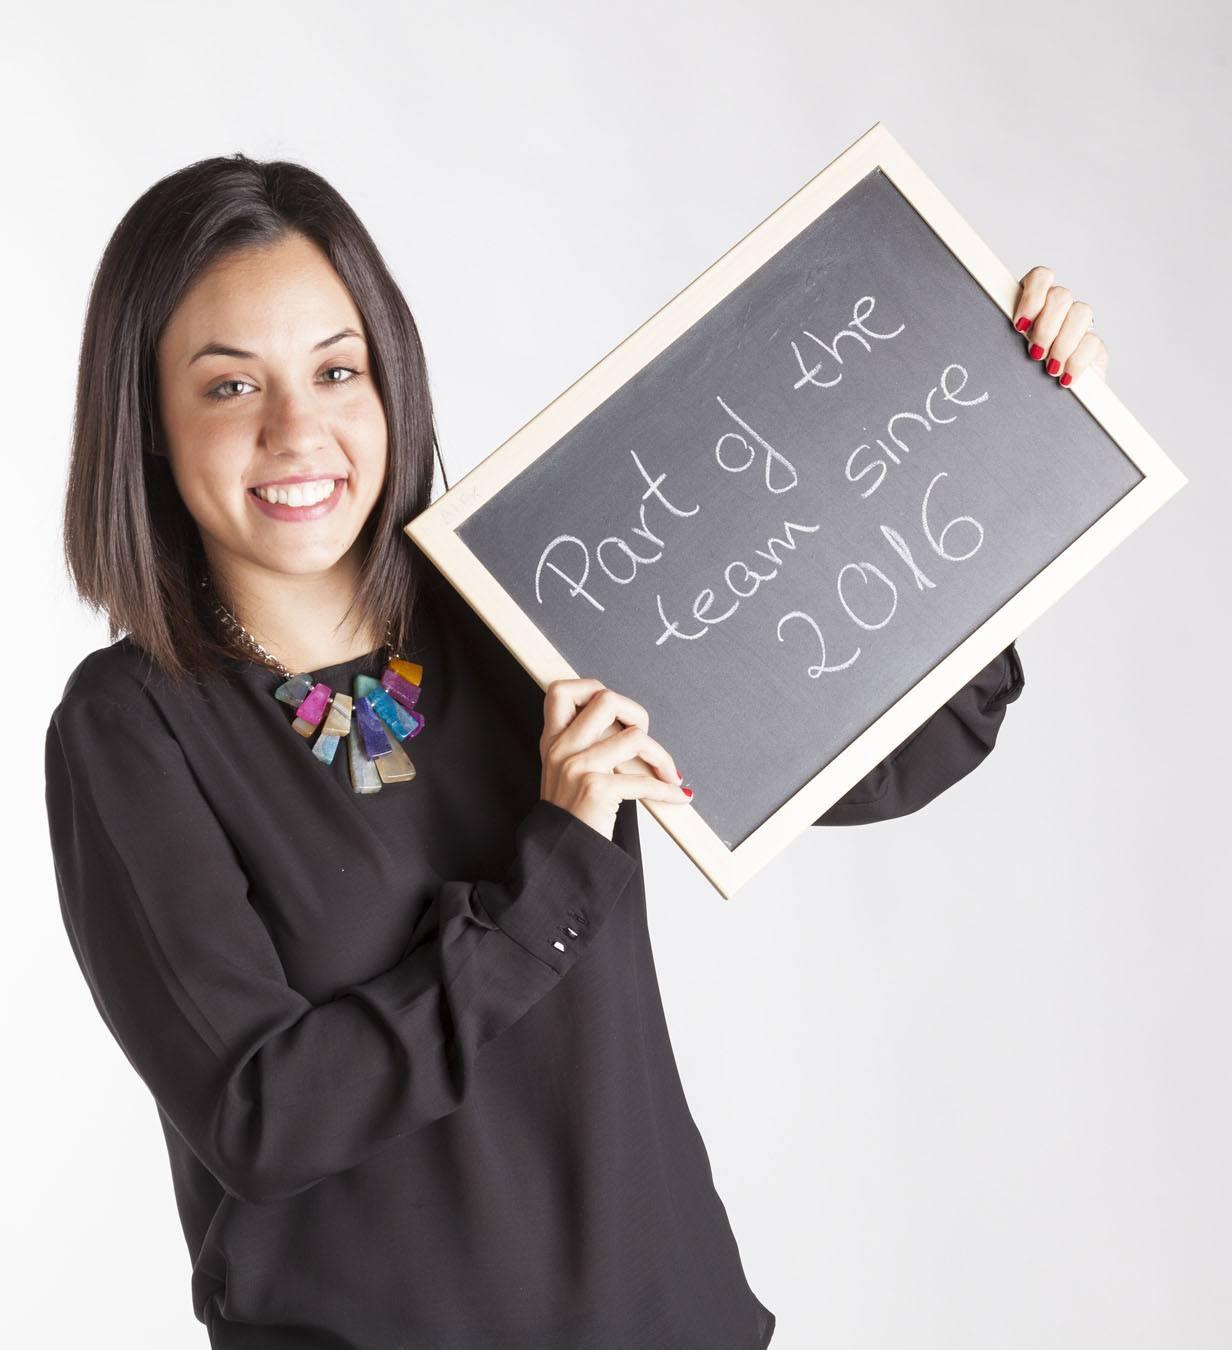 María García - Spanischlehrerin